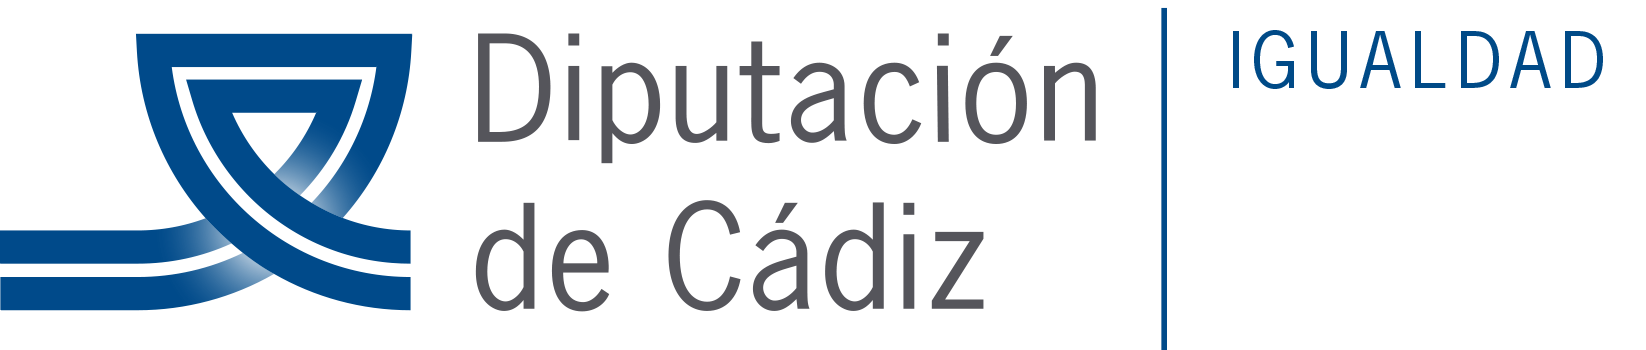 dipuca_igualdad